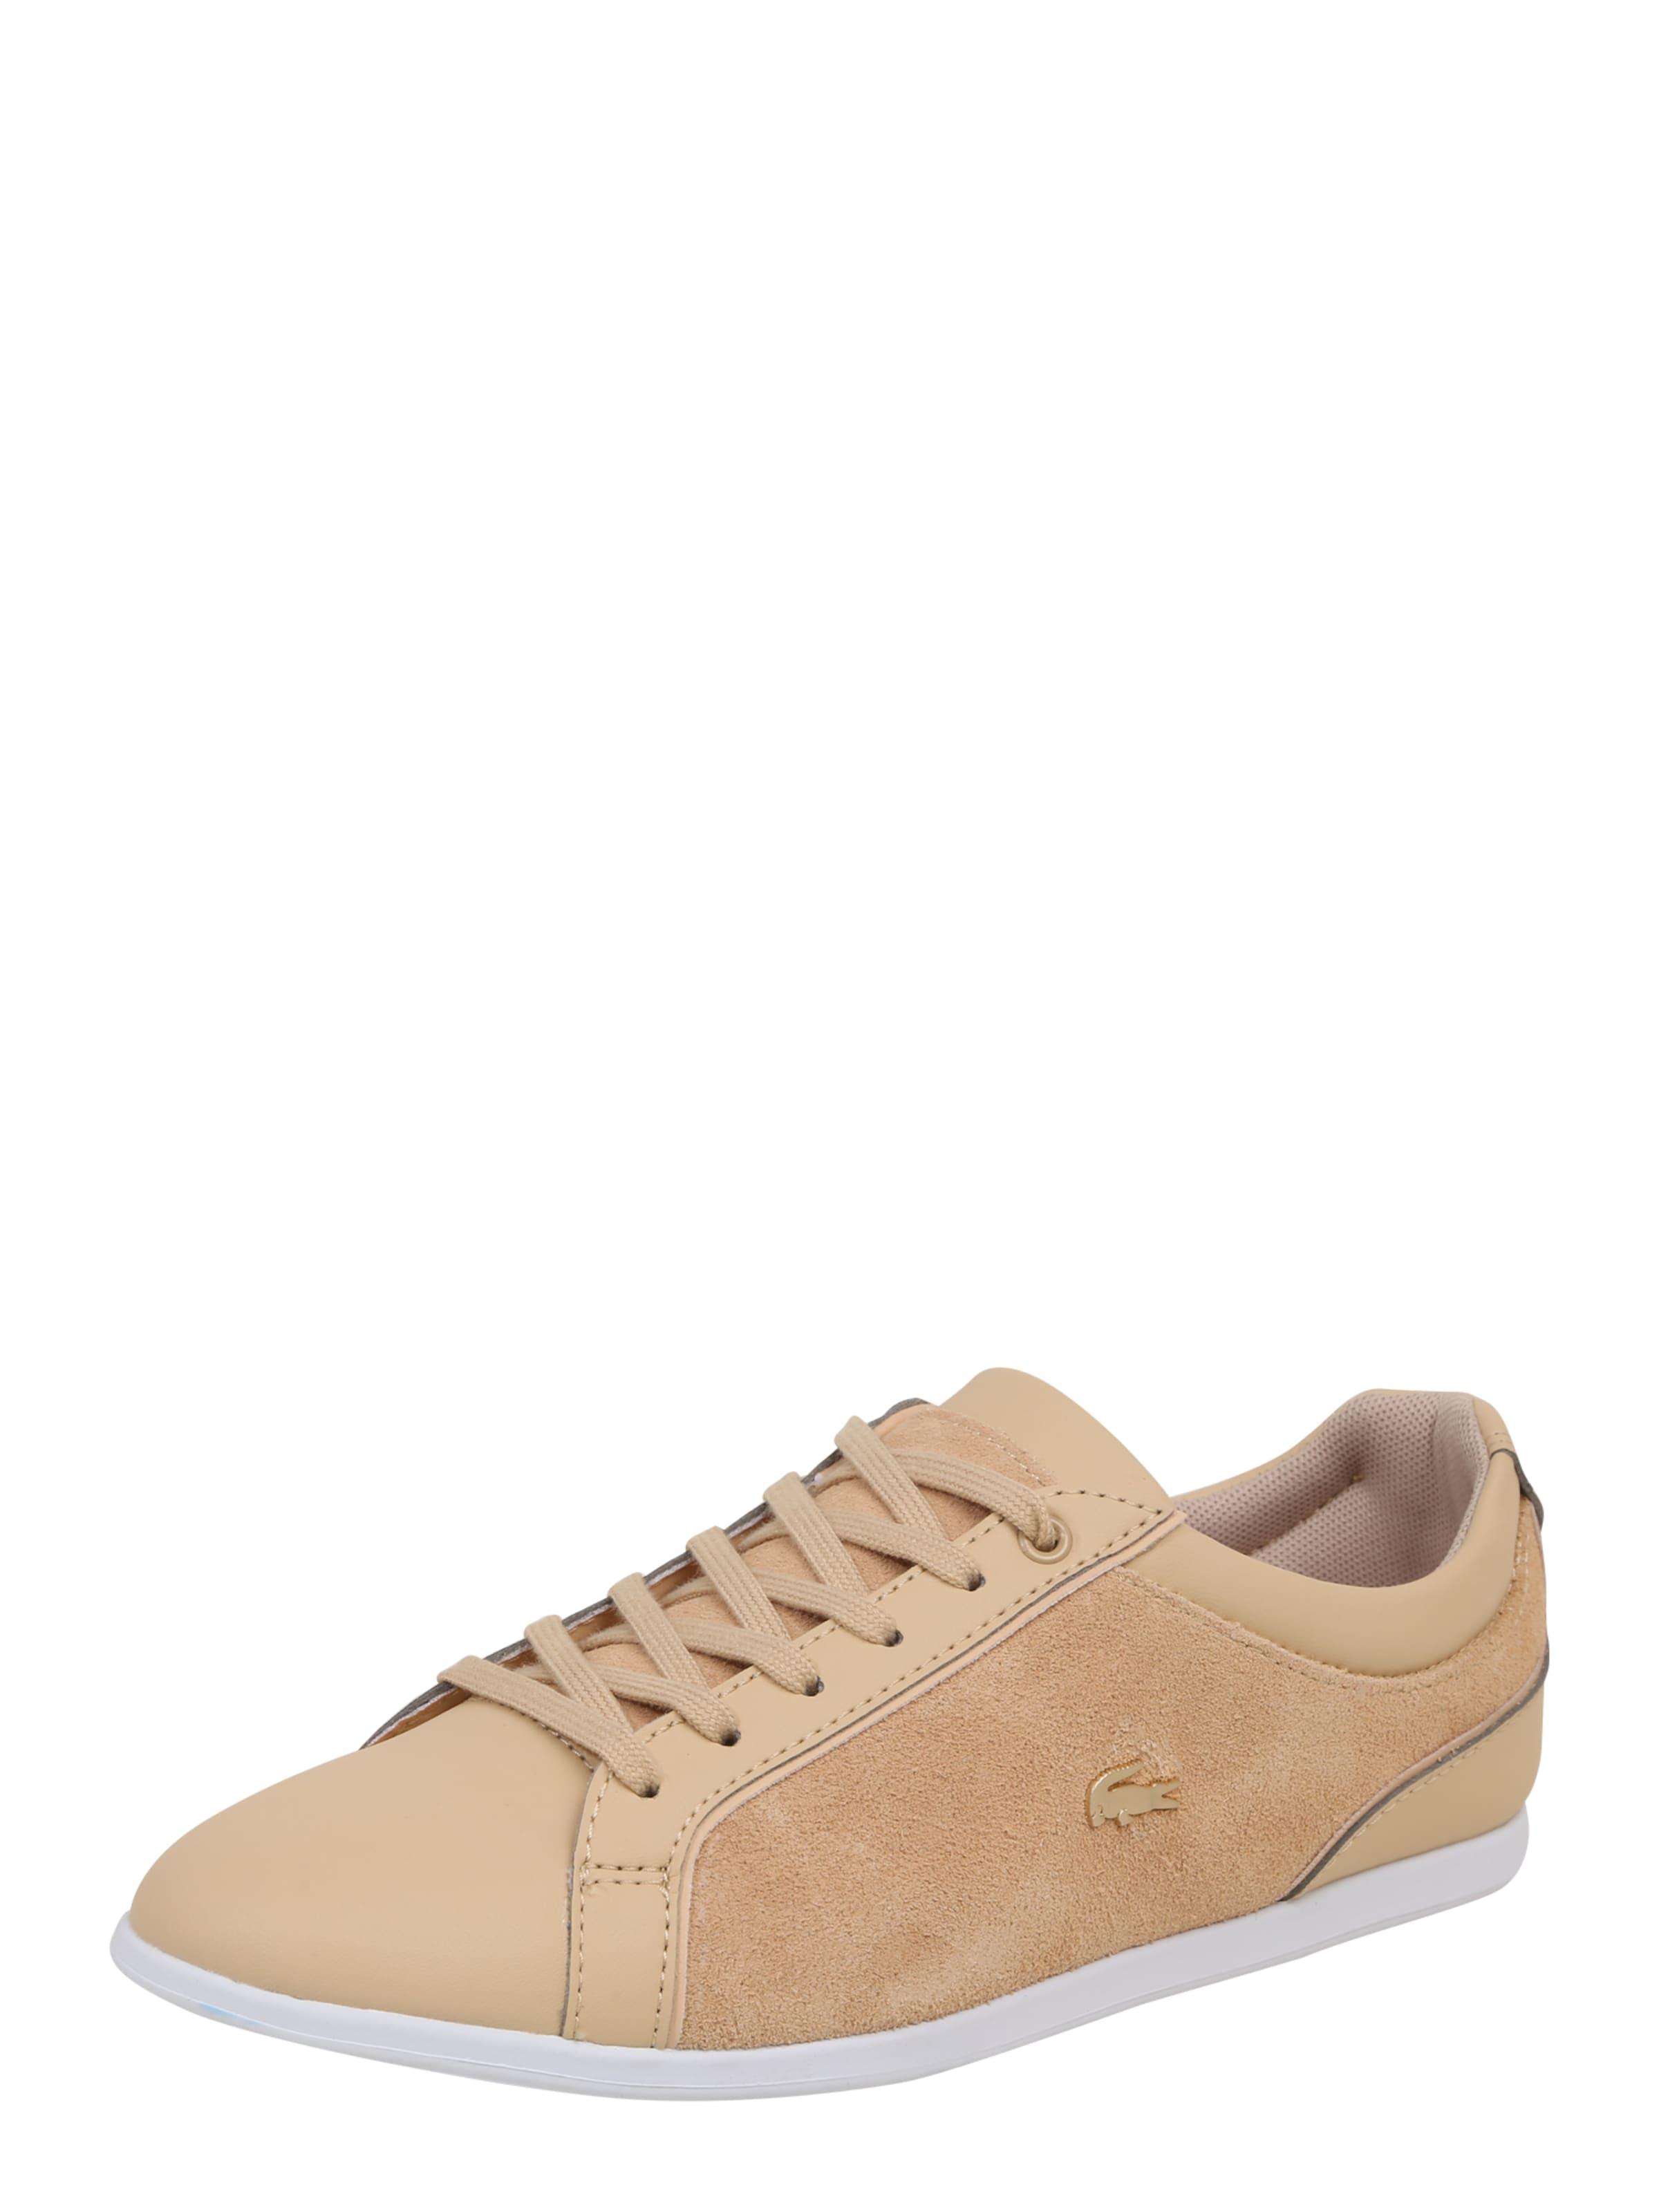 LACOSTE Sneaker REY Verschleißfeste billige Schuhe